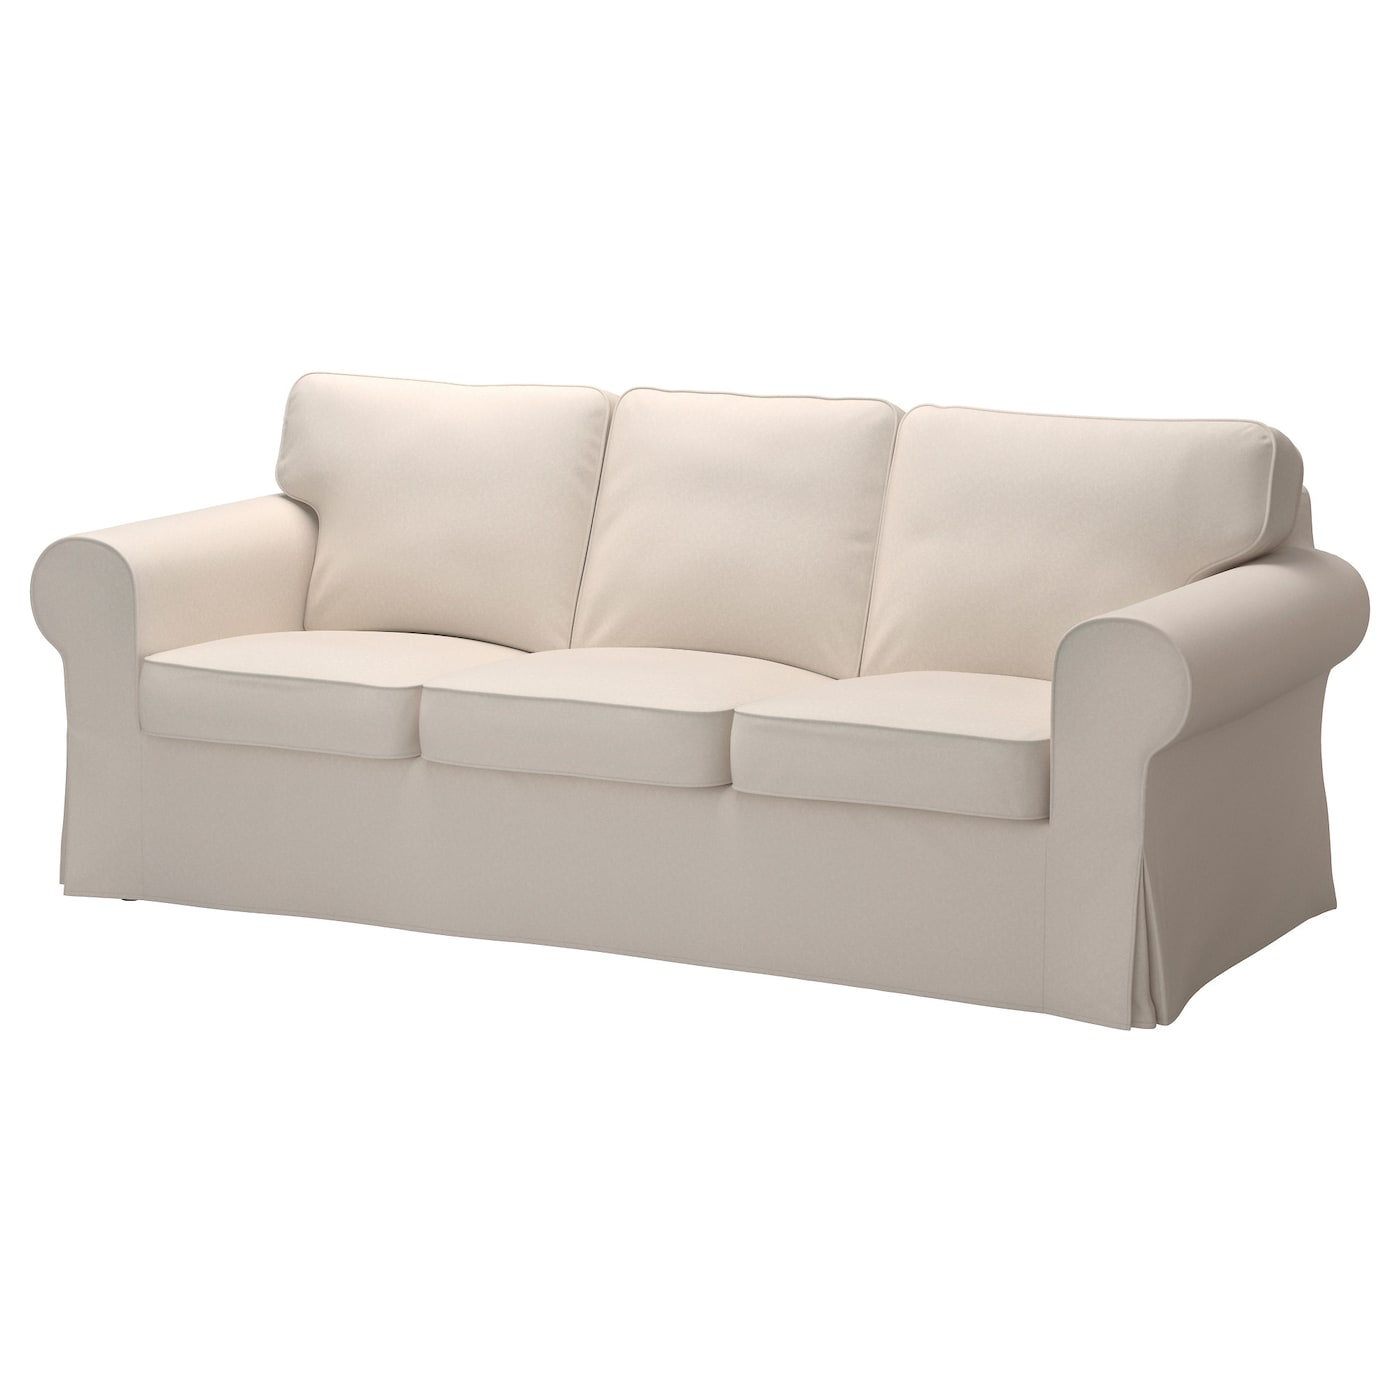 Bankhoes Ikea Bank.Ektorp Cover Three Seat Sofa Lofallet Beige Ikea